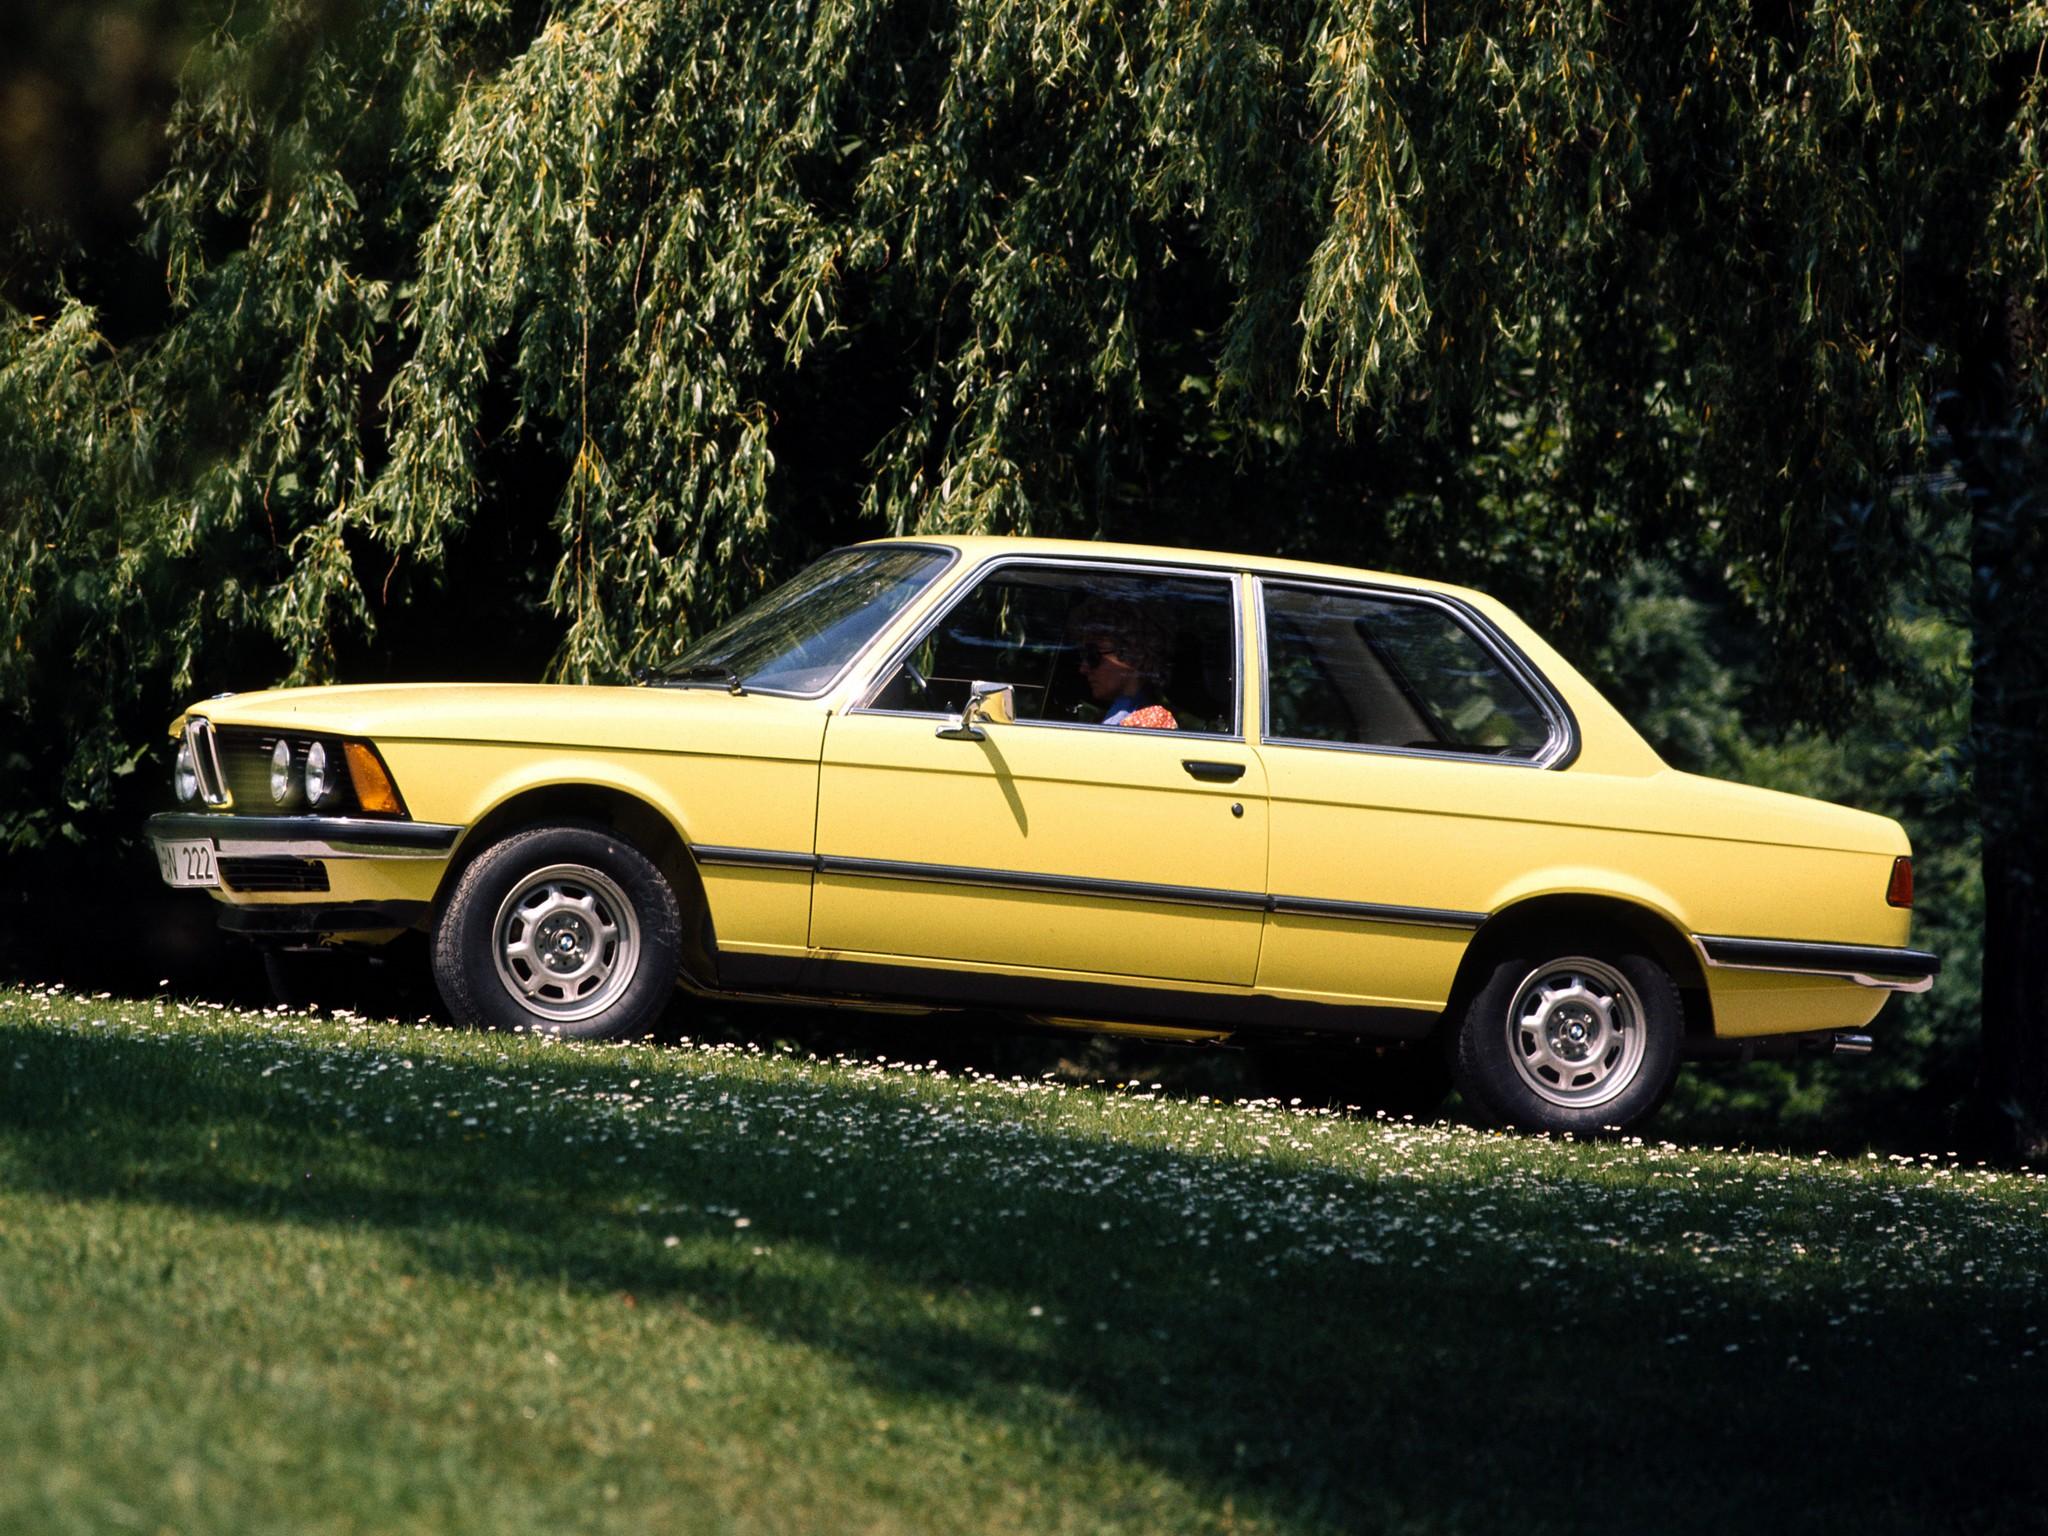 bmw 3 series coupe e21 specs 1975 1976 1977 1978 1979 1980 1981 1982 1983. Black Bedroom Furniture Sets. Home Design Ideas